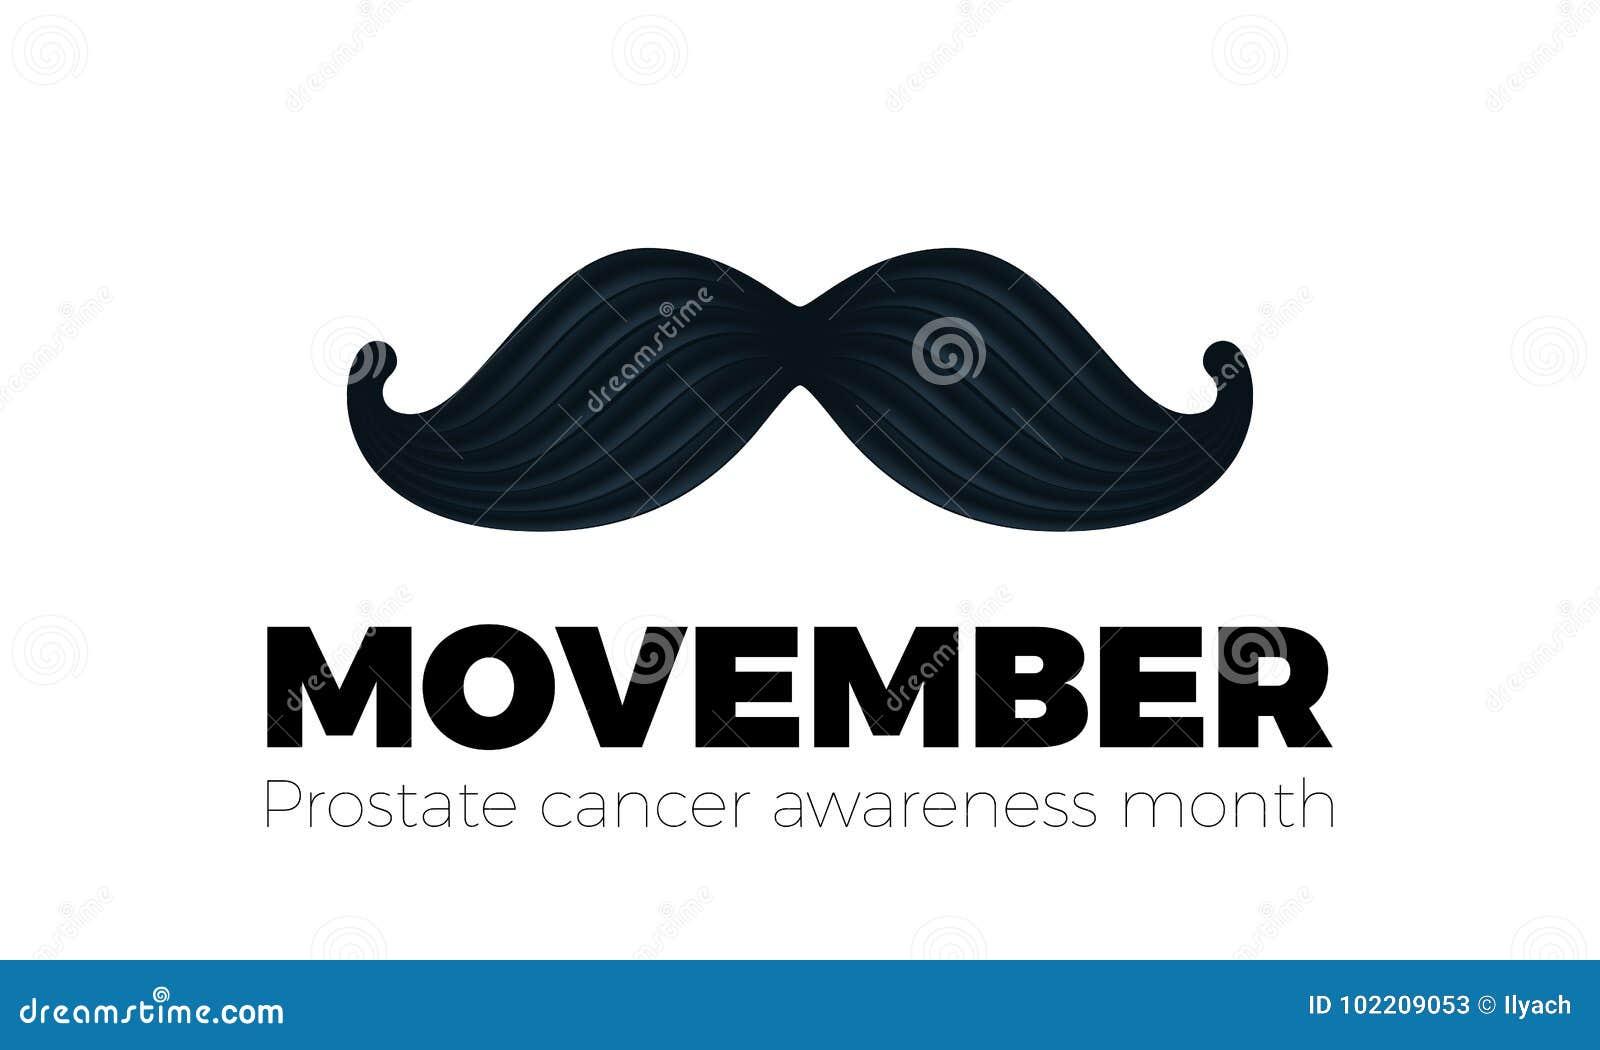 Papillomavirus hpv cin 1, Virusul HPV, asimptomatic - Revista Galenus - Cancer de prostata bigote